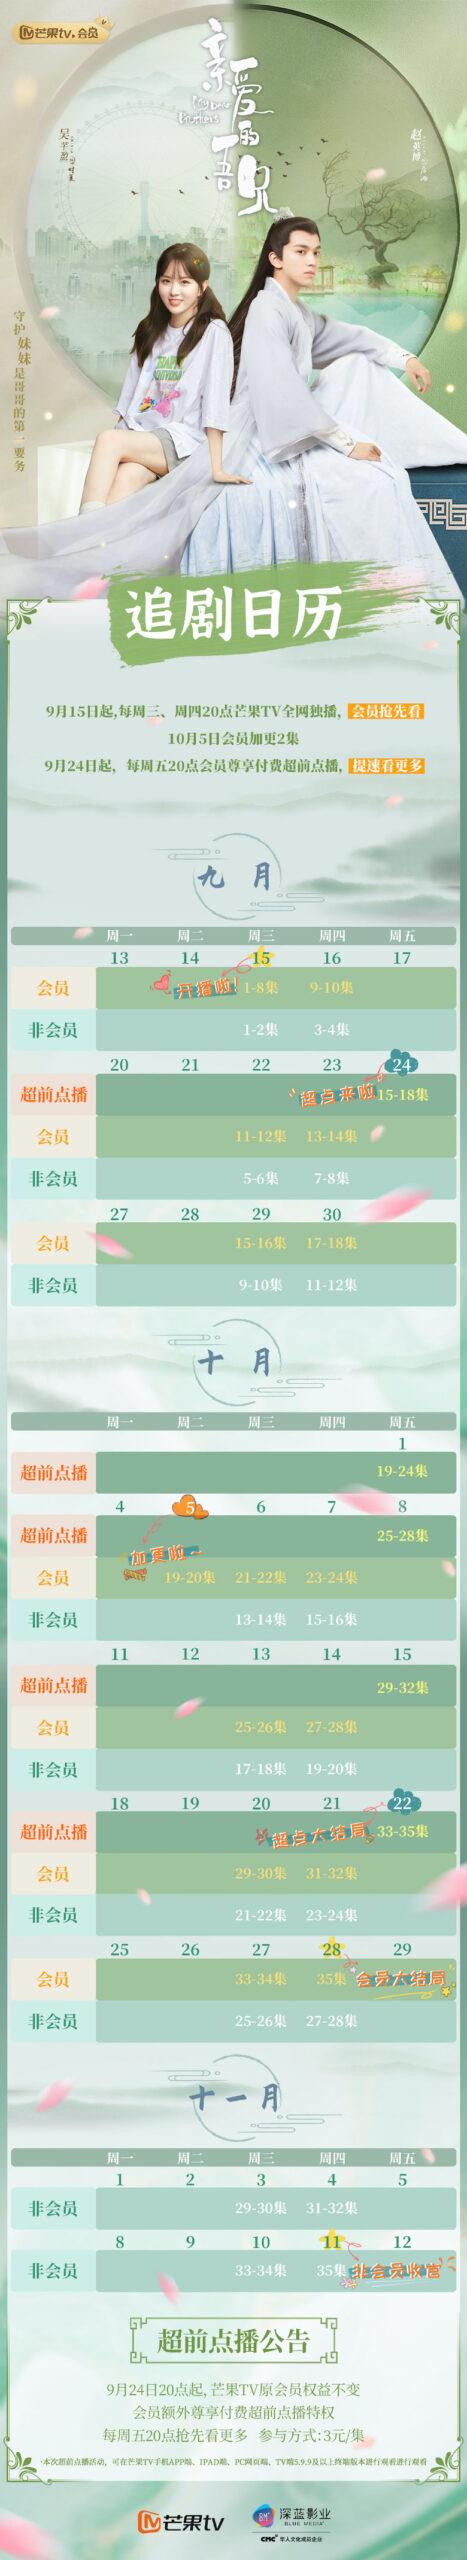 My Dear Brothers Chinese Drama Airing Calendar